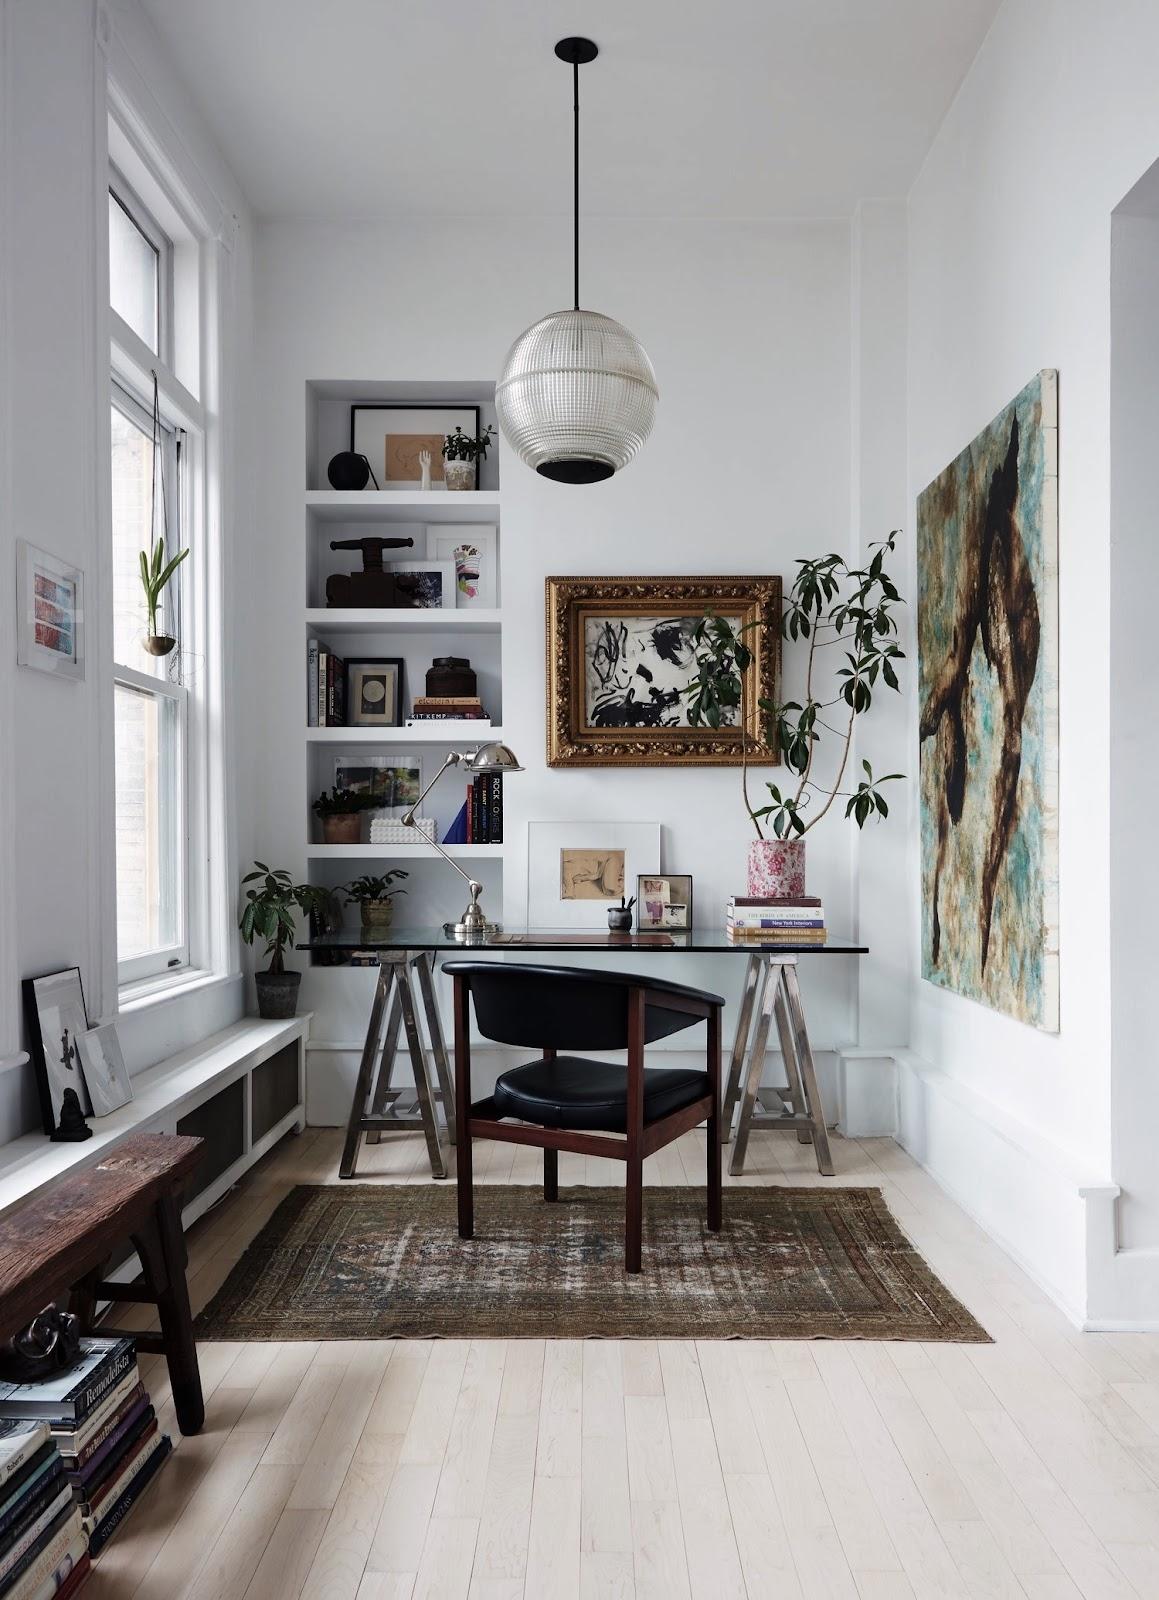 home office design inspiration buckhead built in shelving desk leather chair oversized art rug